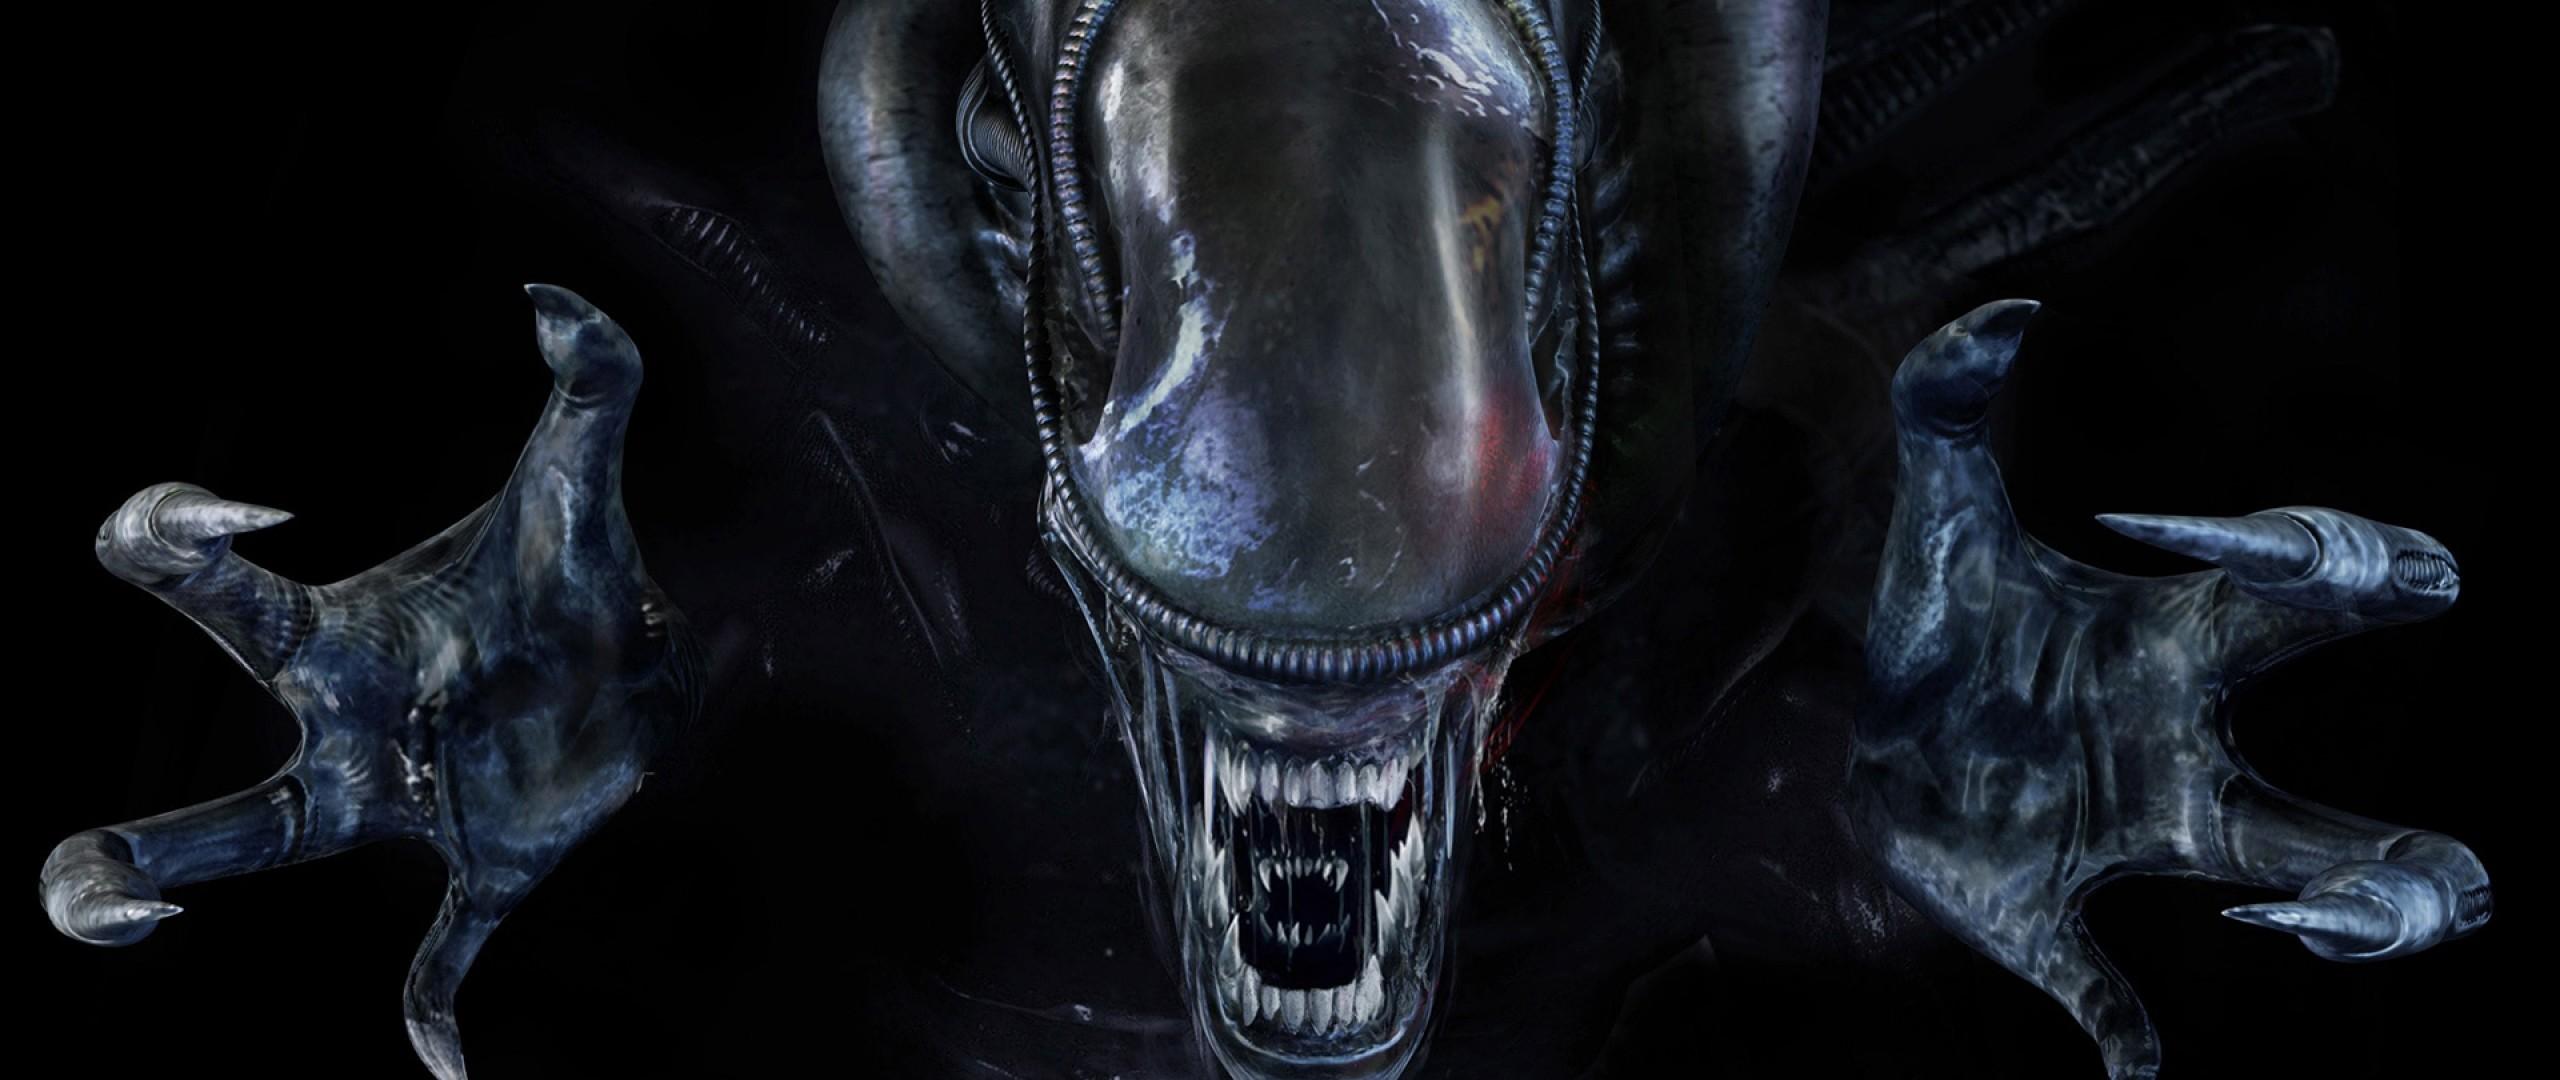 Wallpaper aliens colonial marines, xenomorph, alien